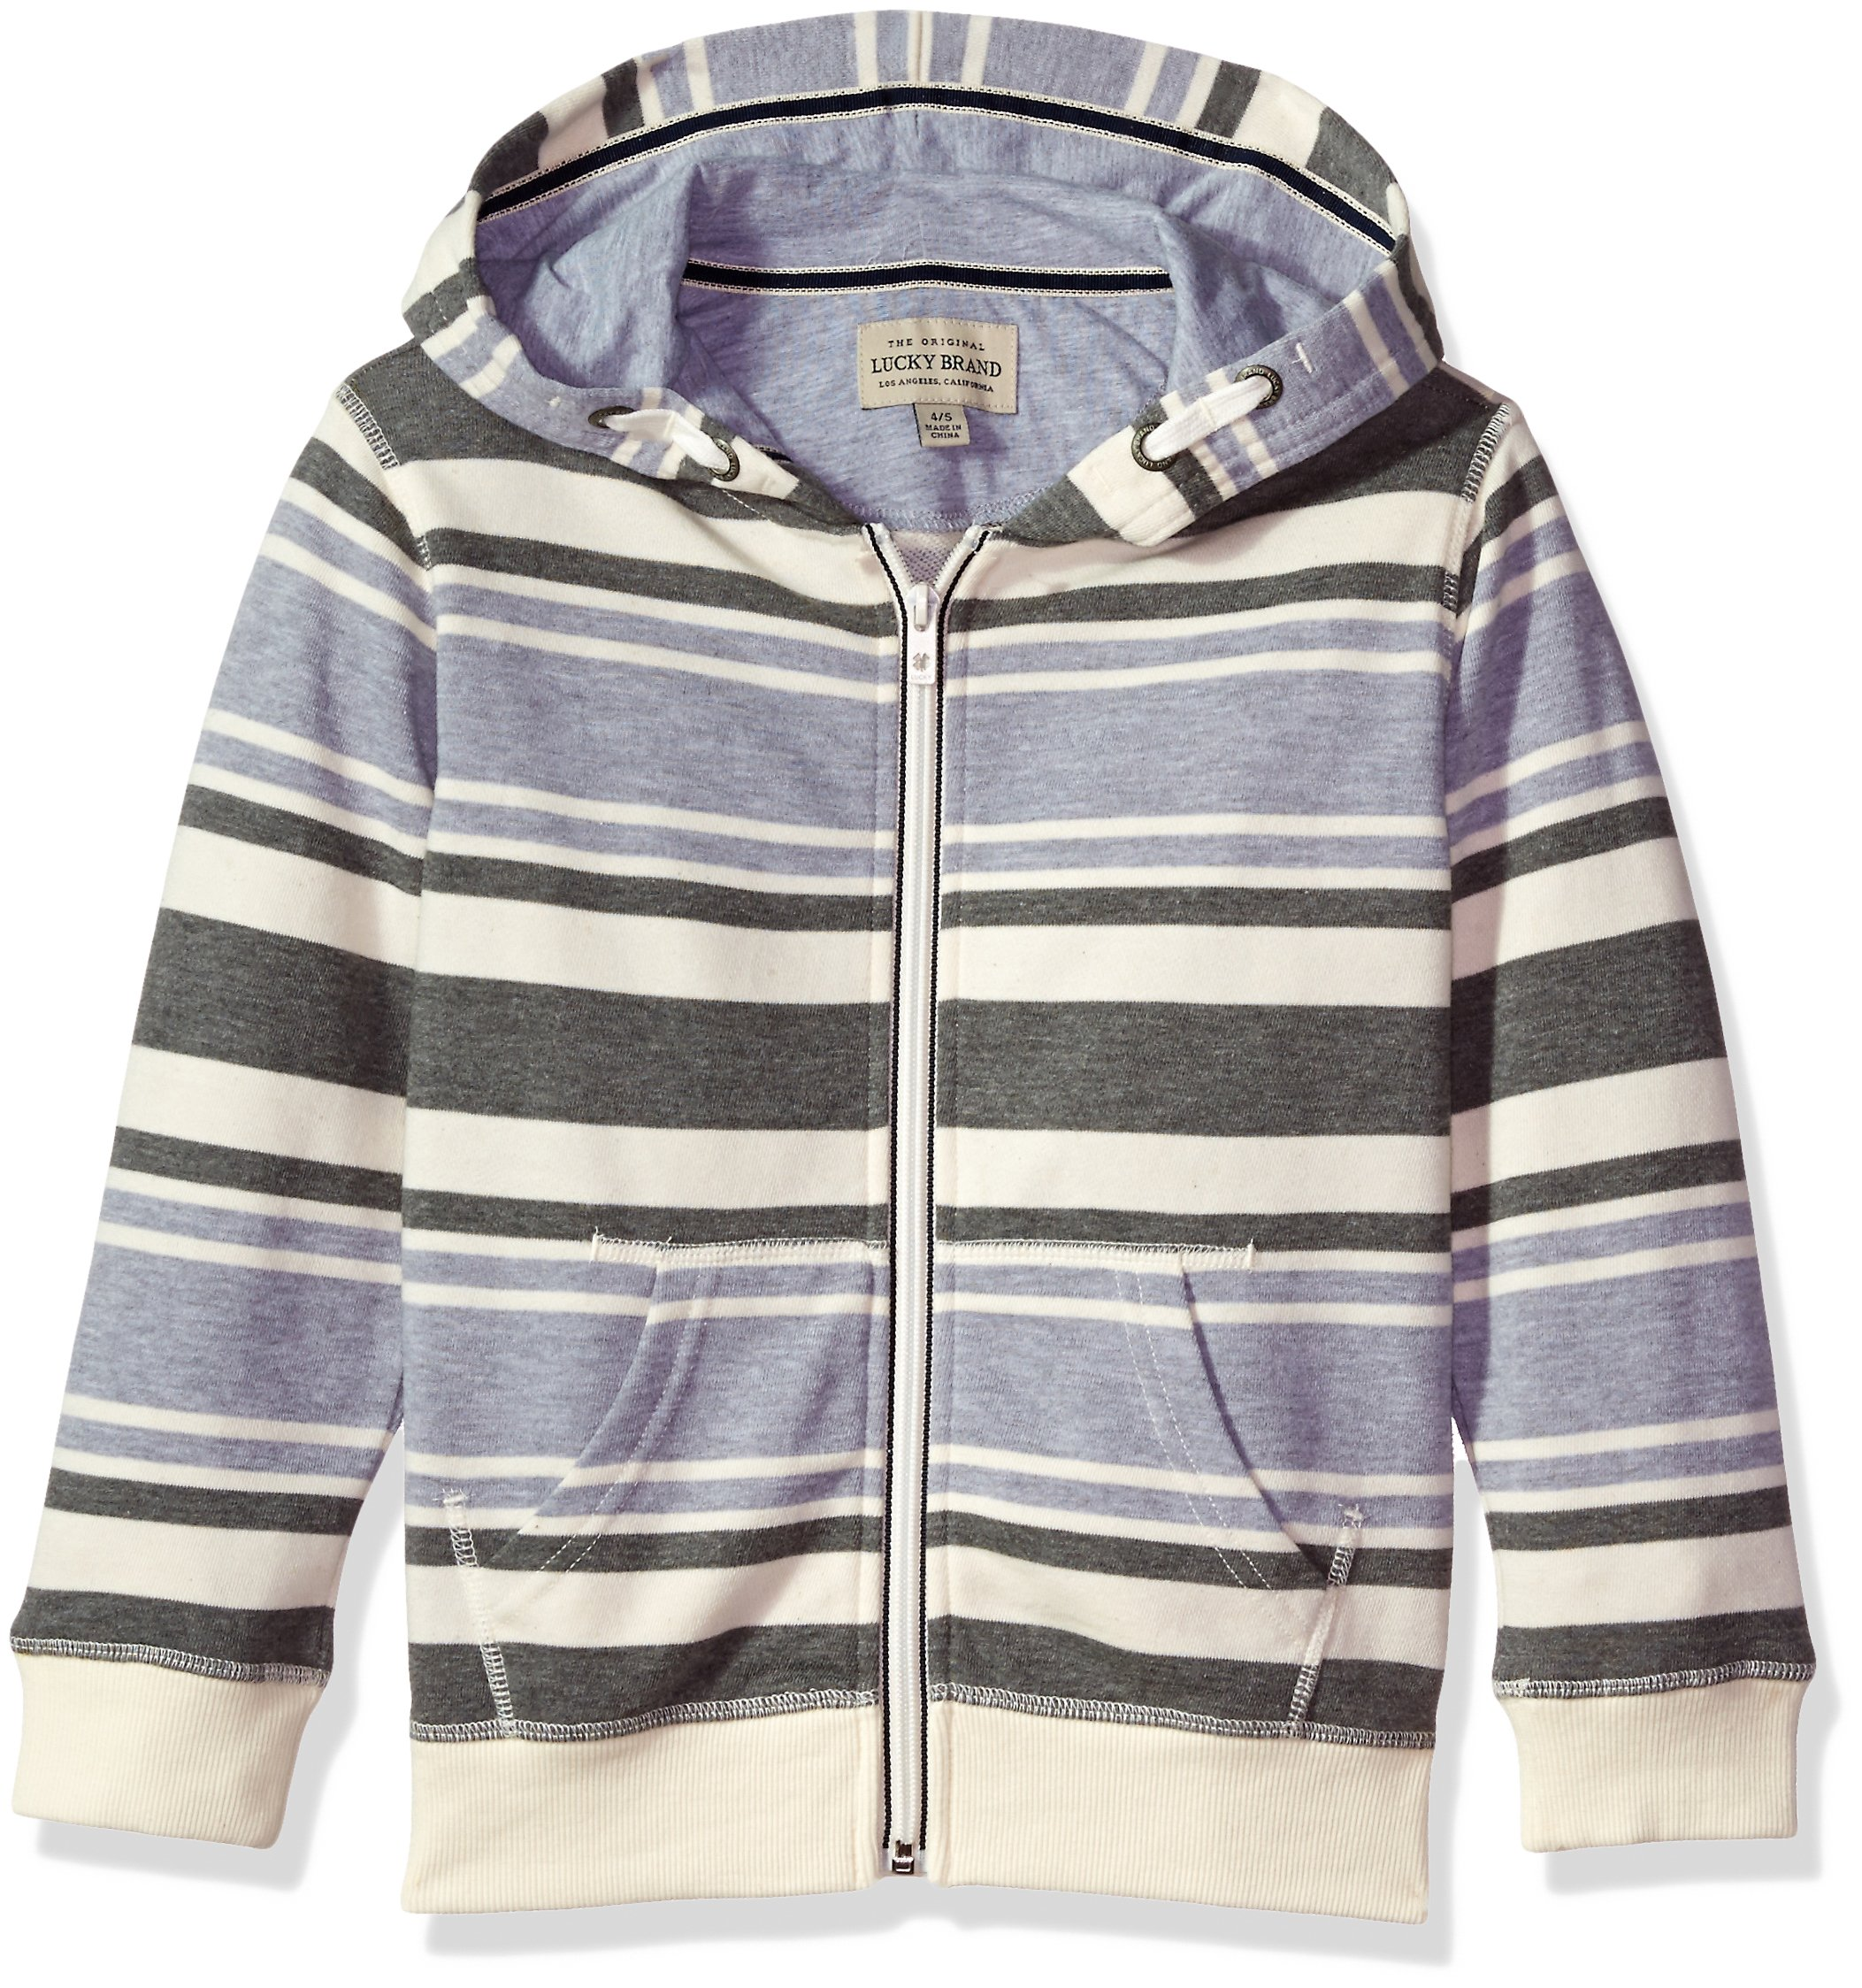 Lucky Brand Boys' Big' Long Sleeve Stripe French Terry Full Zip Hoodie, Birch, X-Large (18/20)